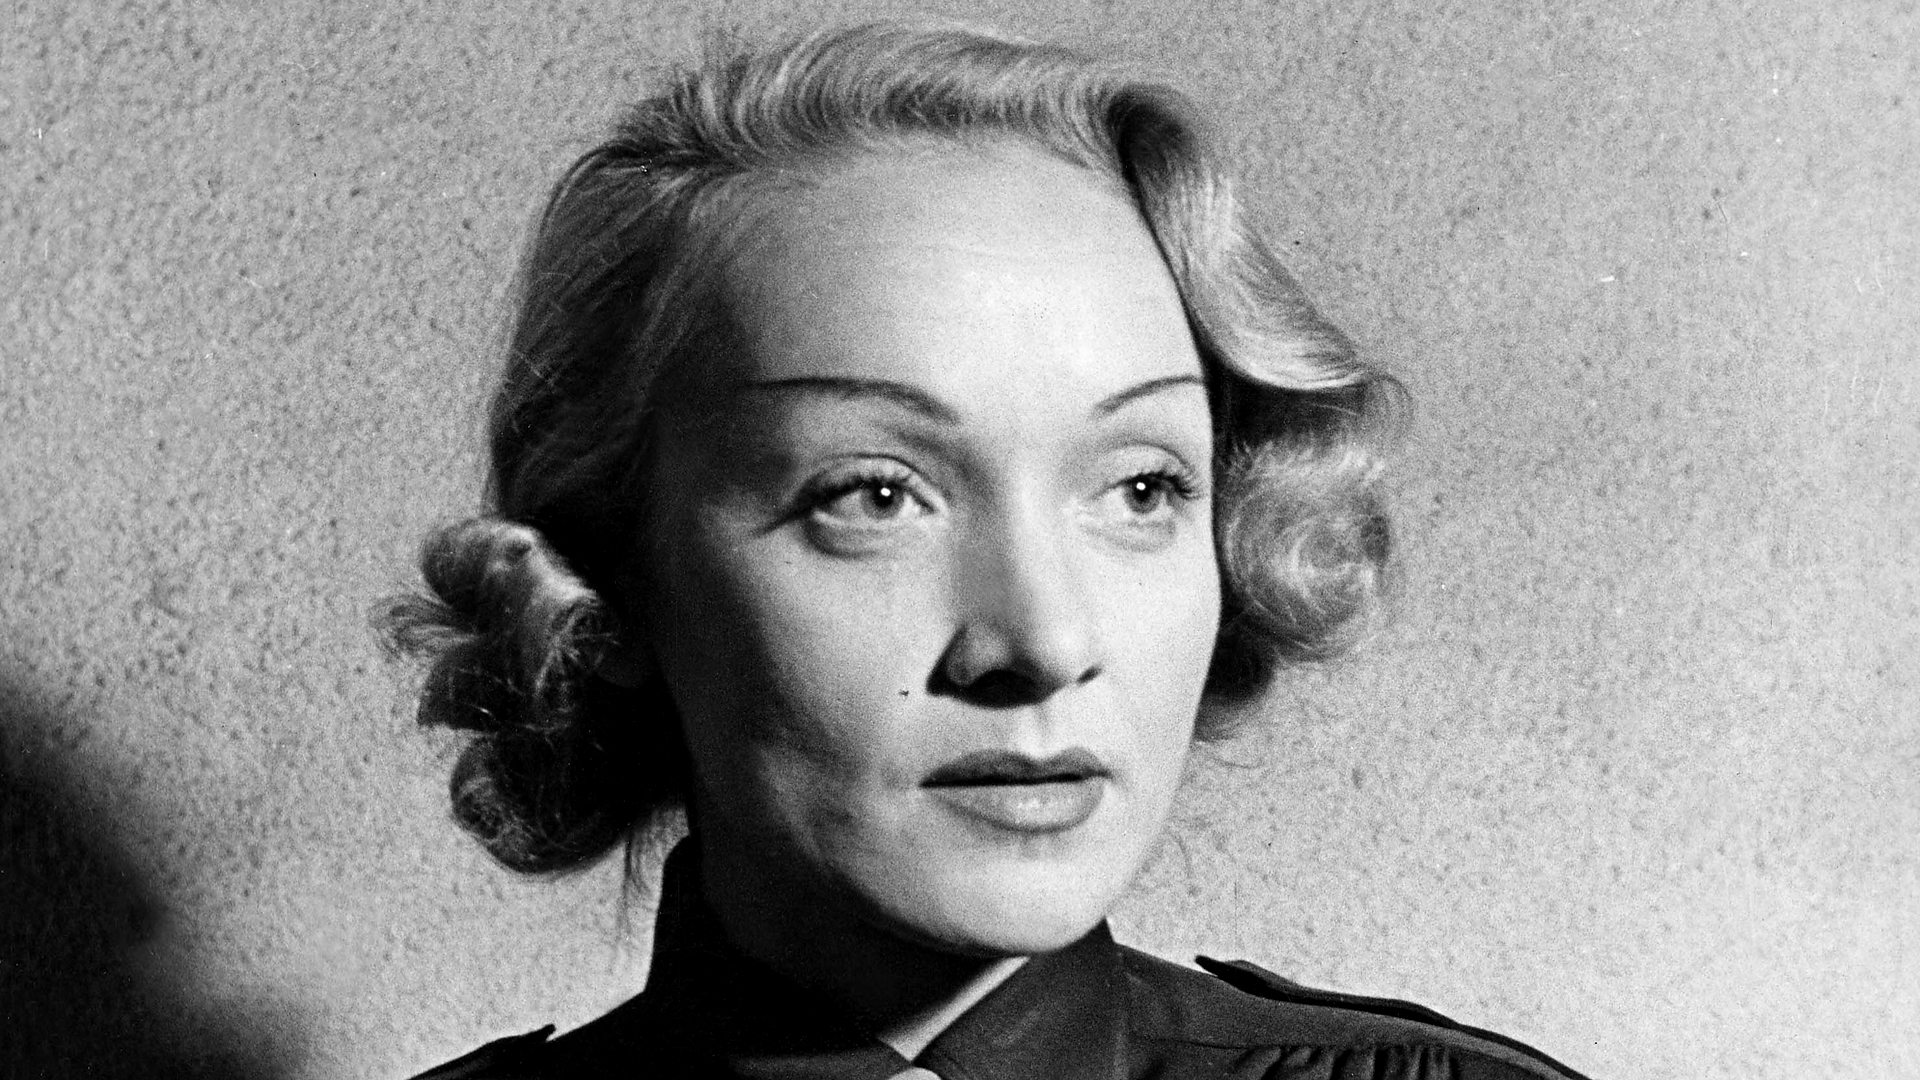 Bbc Radio 4  Woman's Hour, Marlene Dietrich; Sex Lives In The Arab World;  Prostitution  The Political Debate